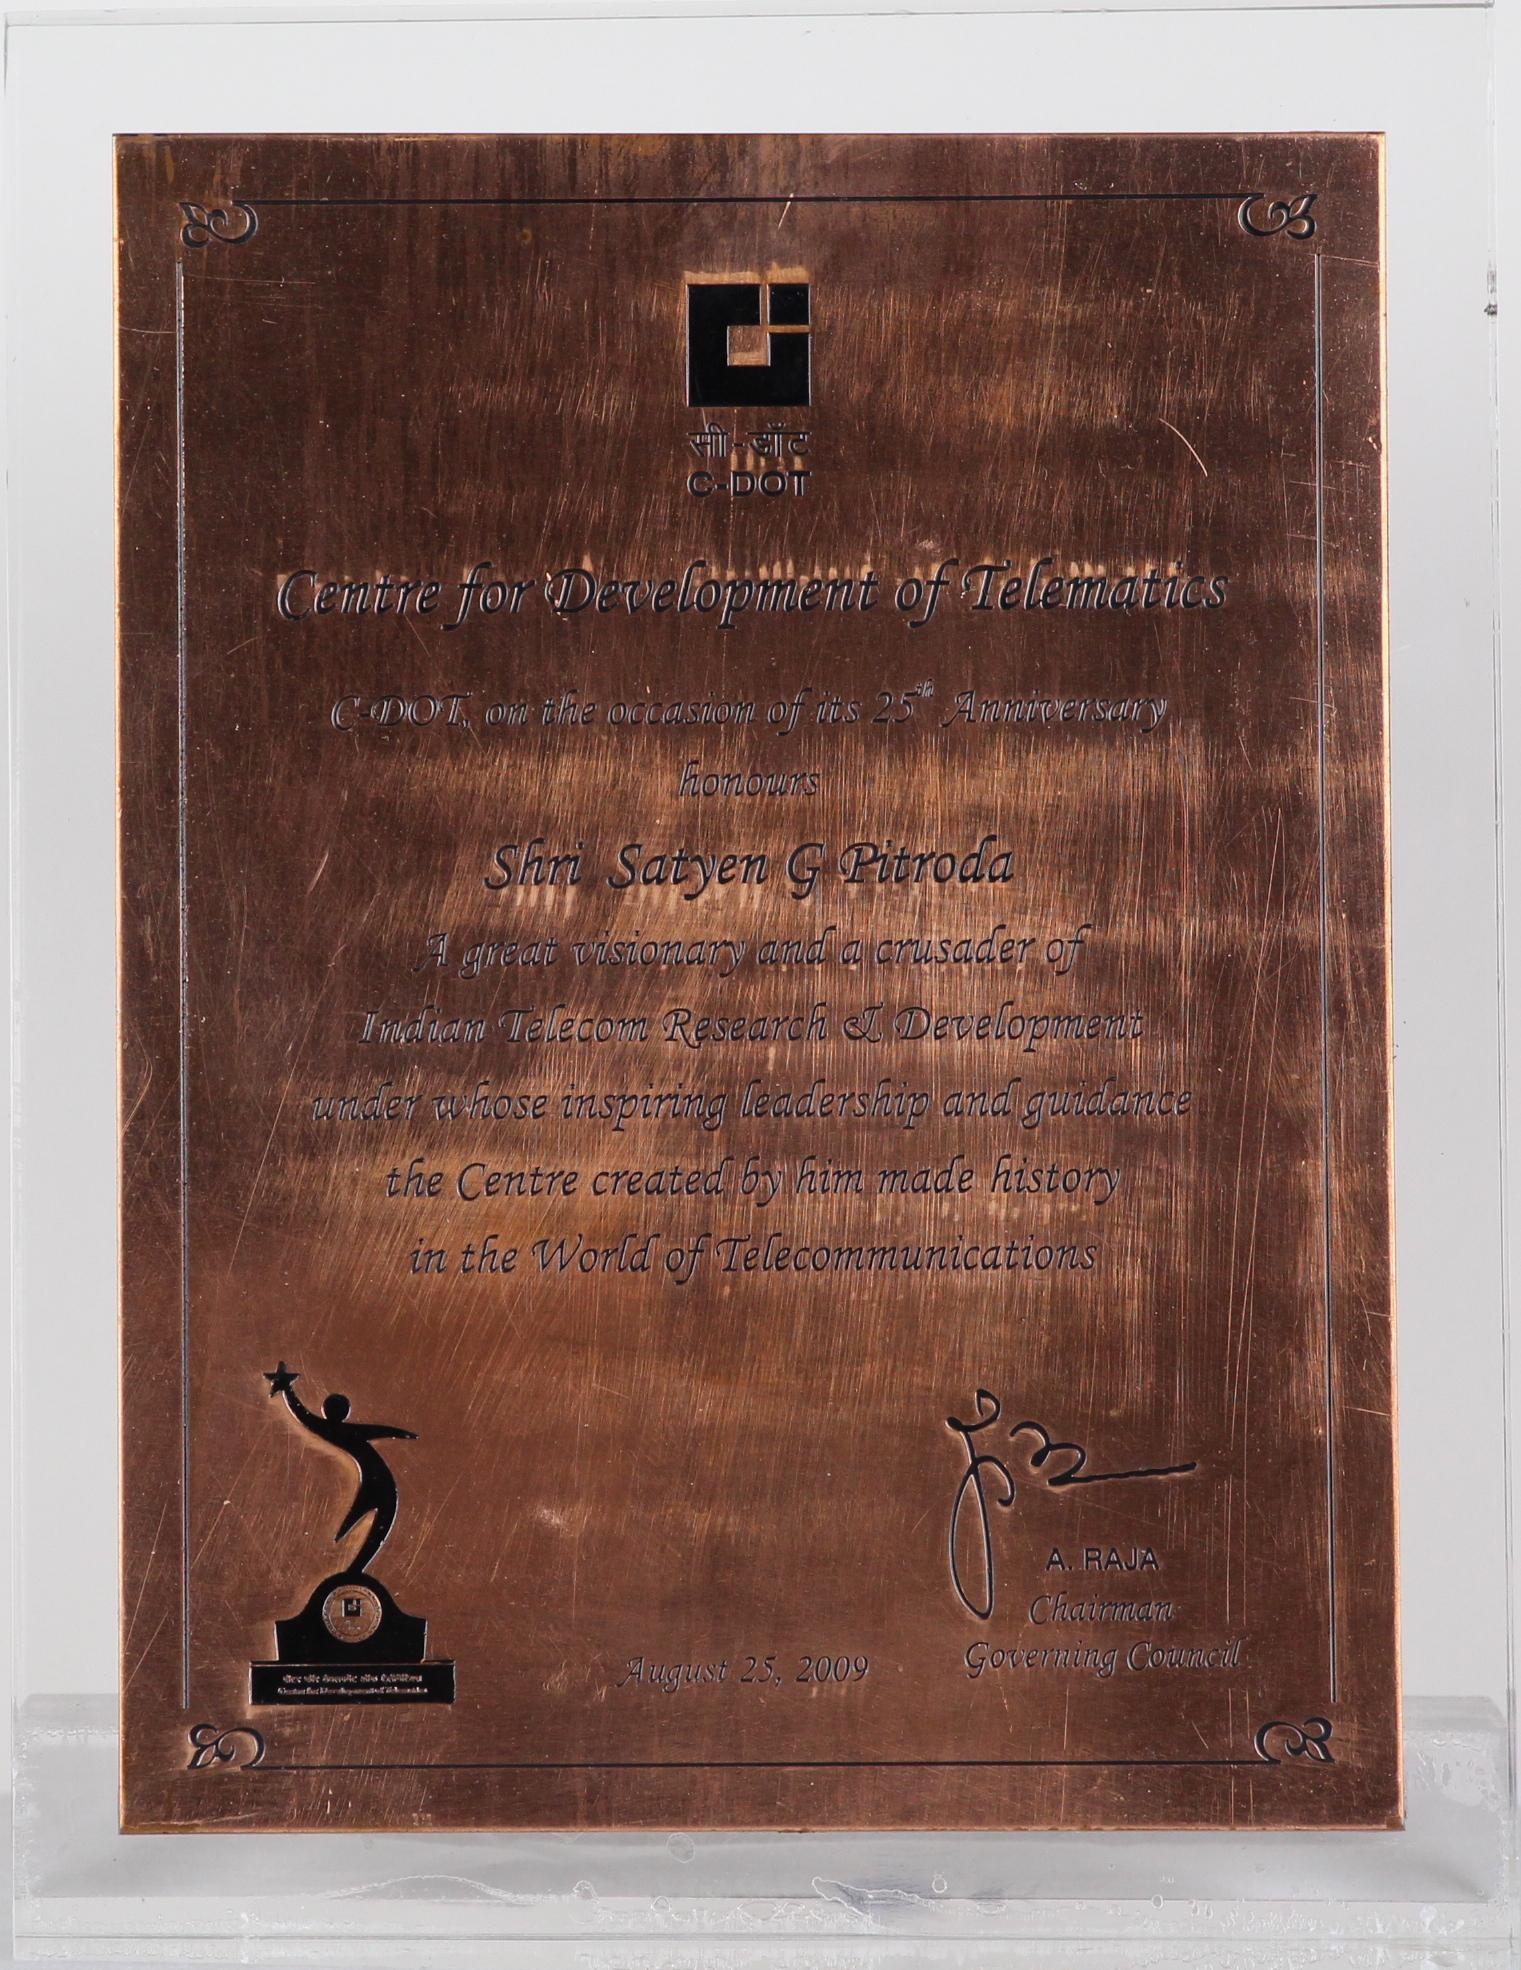 25th Anniversary Award, C-DOT, 2009